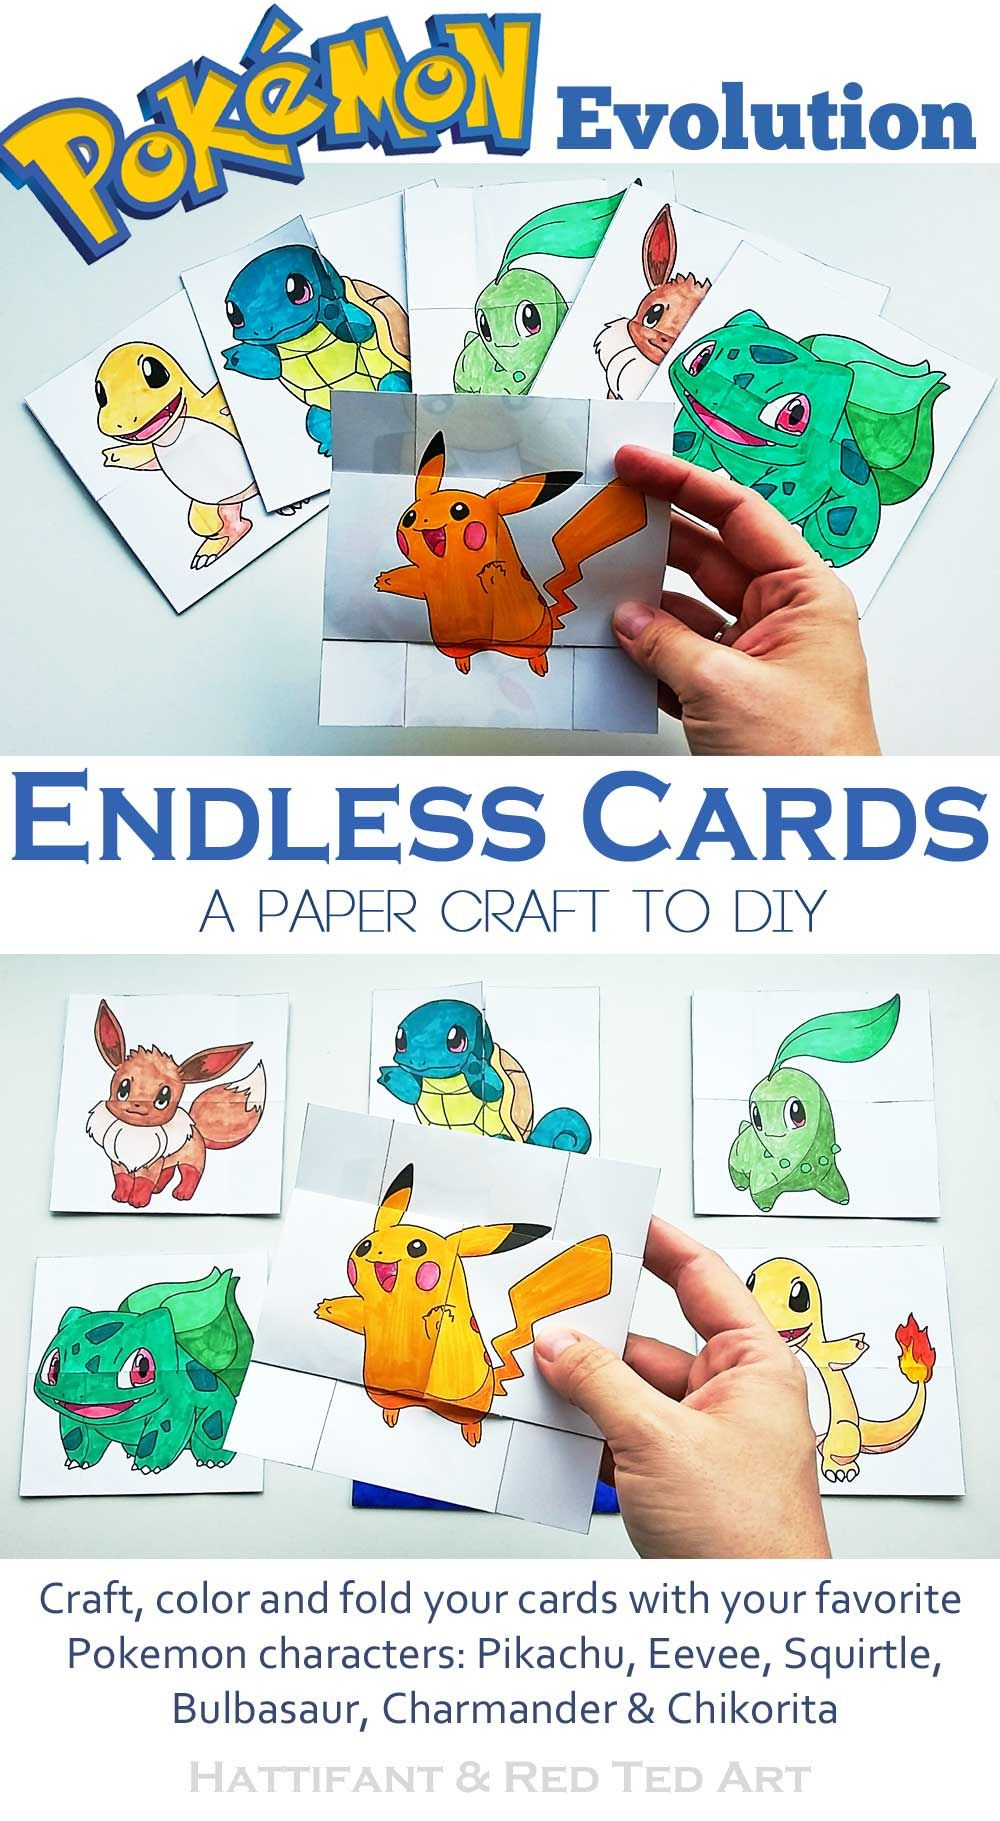 Hattifant Pokemon Evolution Endless Neverending Cards Papercraft Printable Pokemon Craft Diy Pokemon Cards Pokemon Birthday Card